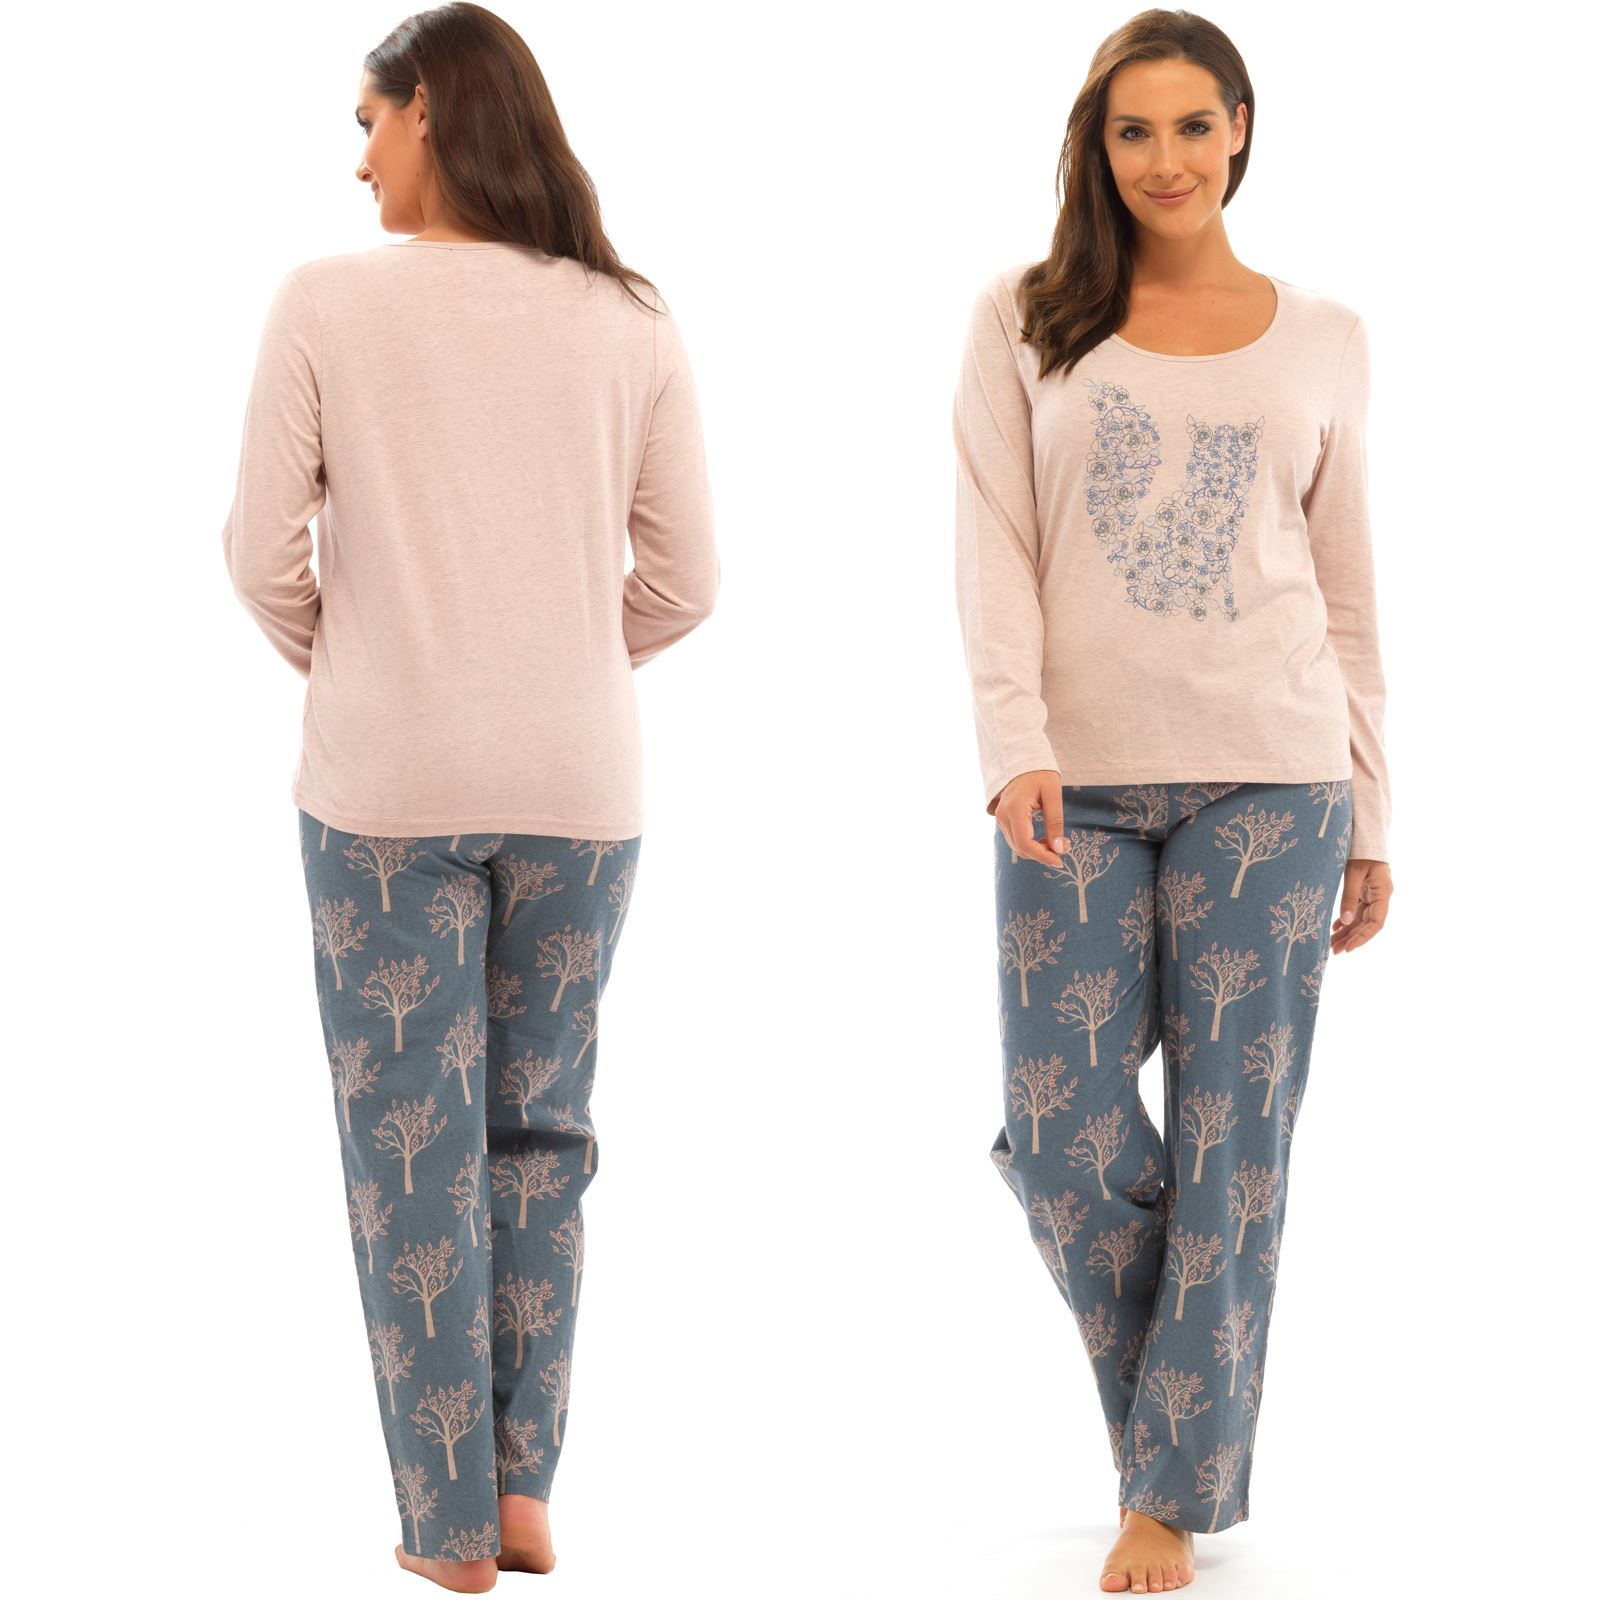 0a9c6276d7 Details about Ladies Pyjama Set Animal Design Top Woodland Print Flannel  Trousers Deer Or Fox